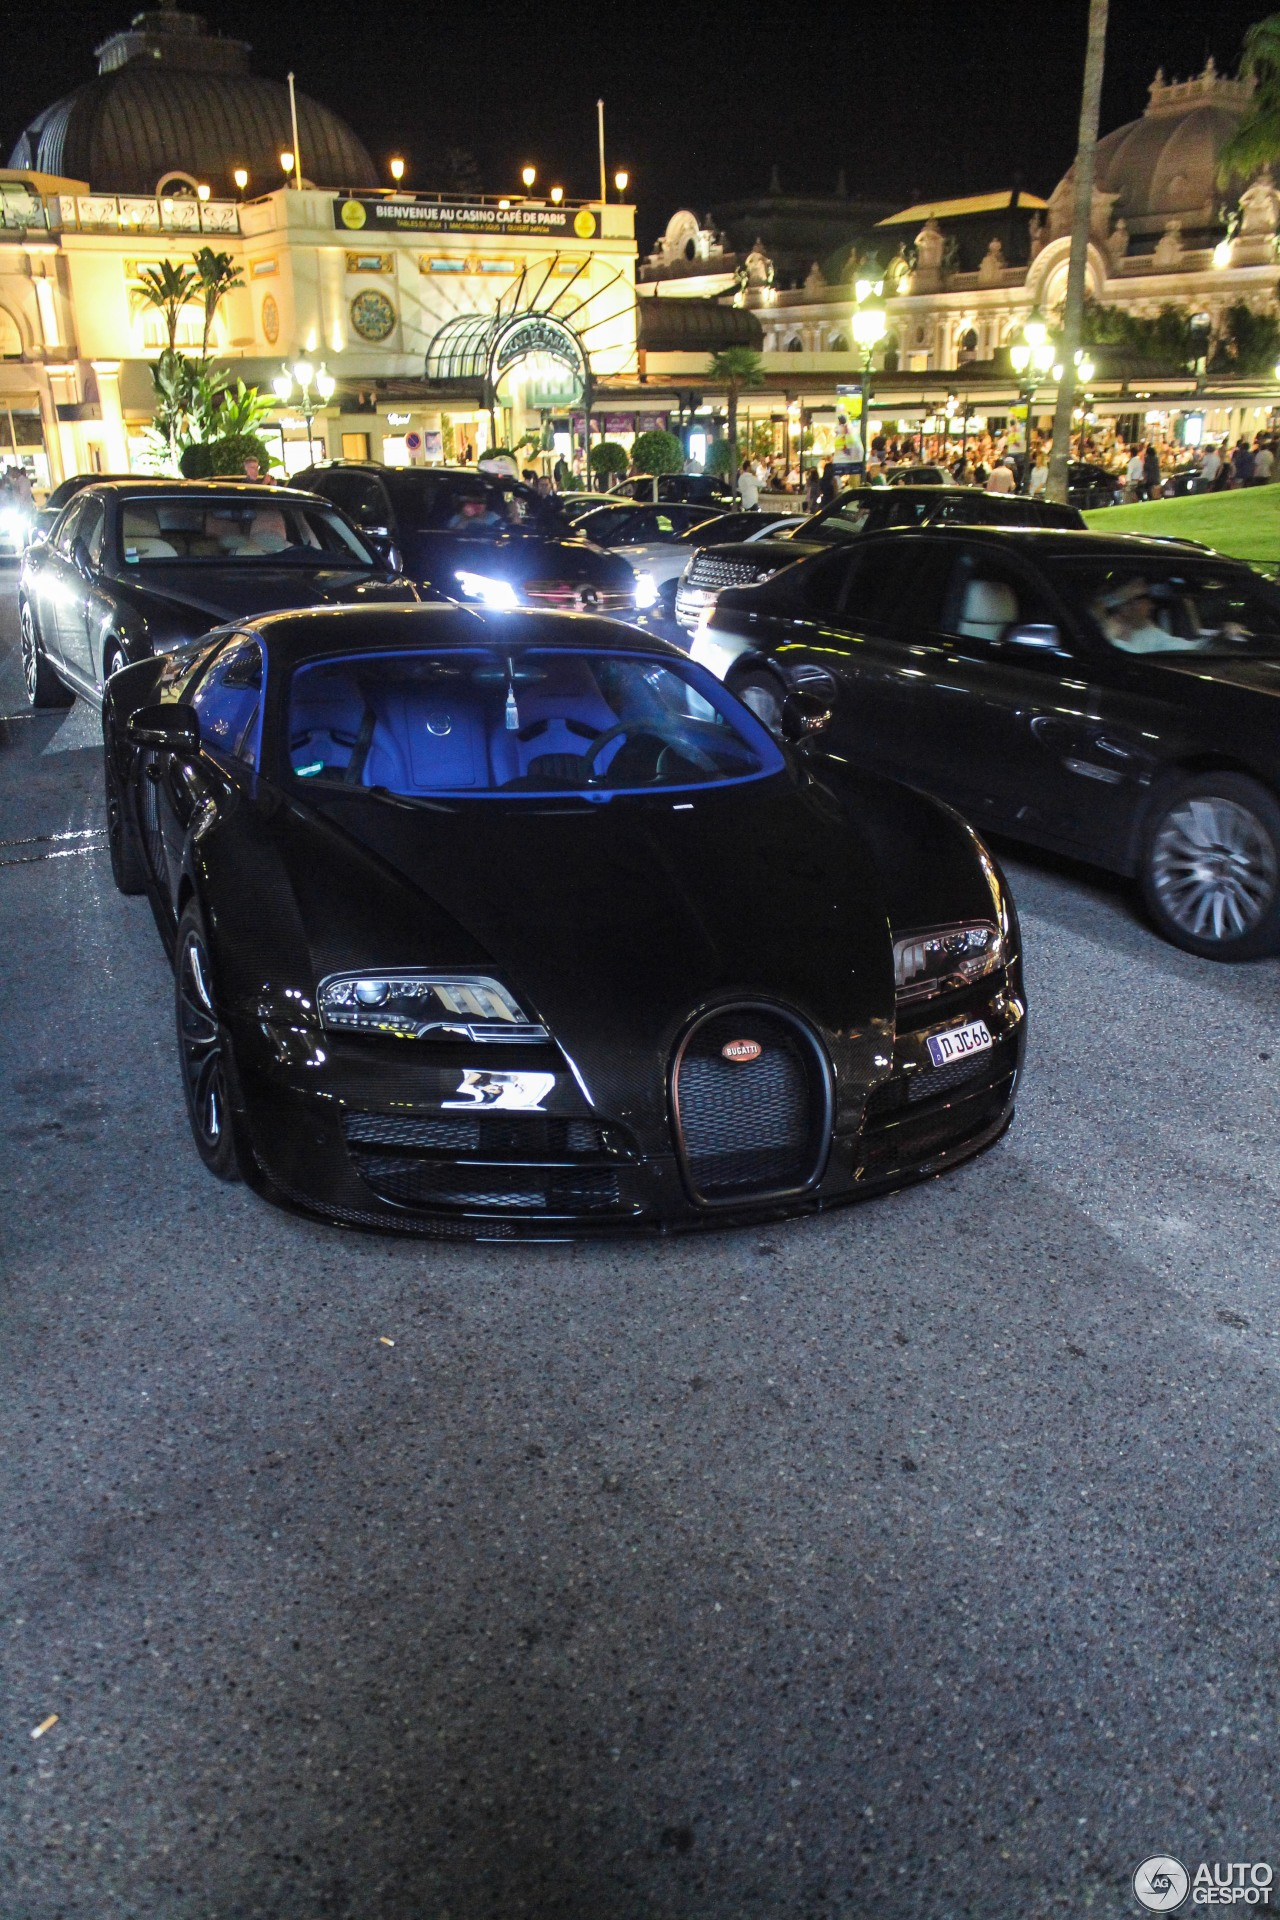 bugatti-veyron-164-super-sport-edition-merveilleux-c659212082017182011_5 Stunning Bugatti Veyron Price In Brazil Cars Trend